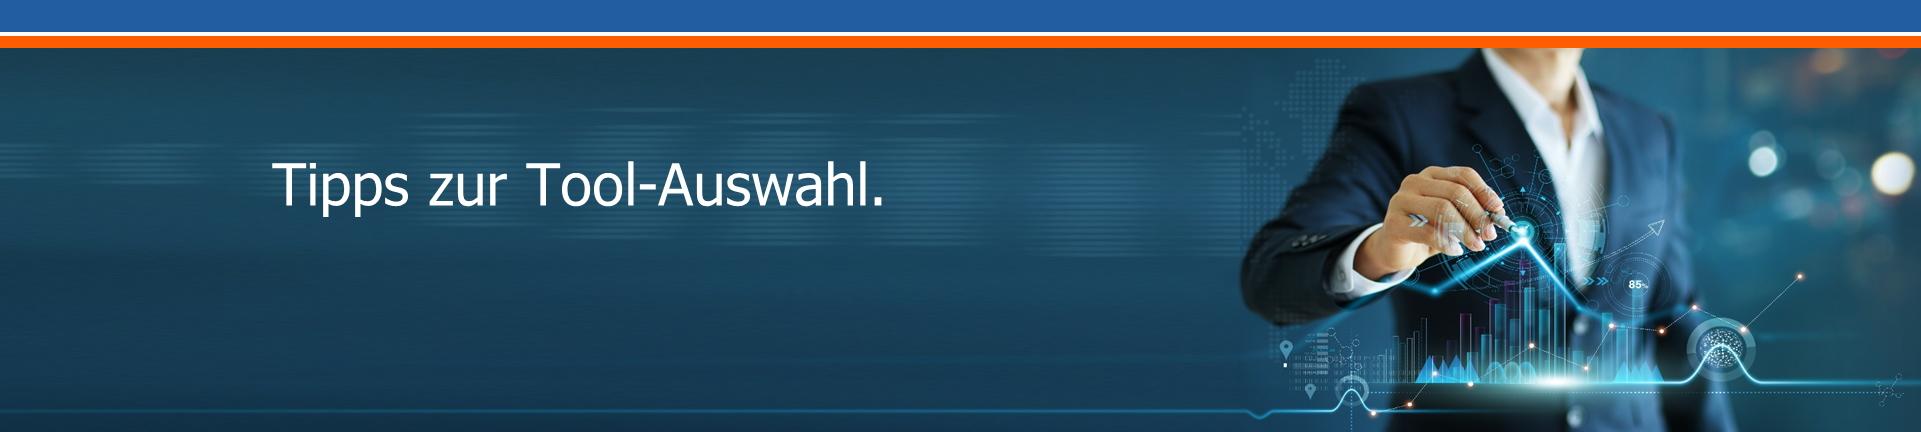 swot-analyse-tipps-zur-swot-analyse-tool-auswahl-header